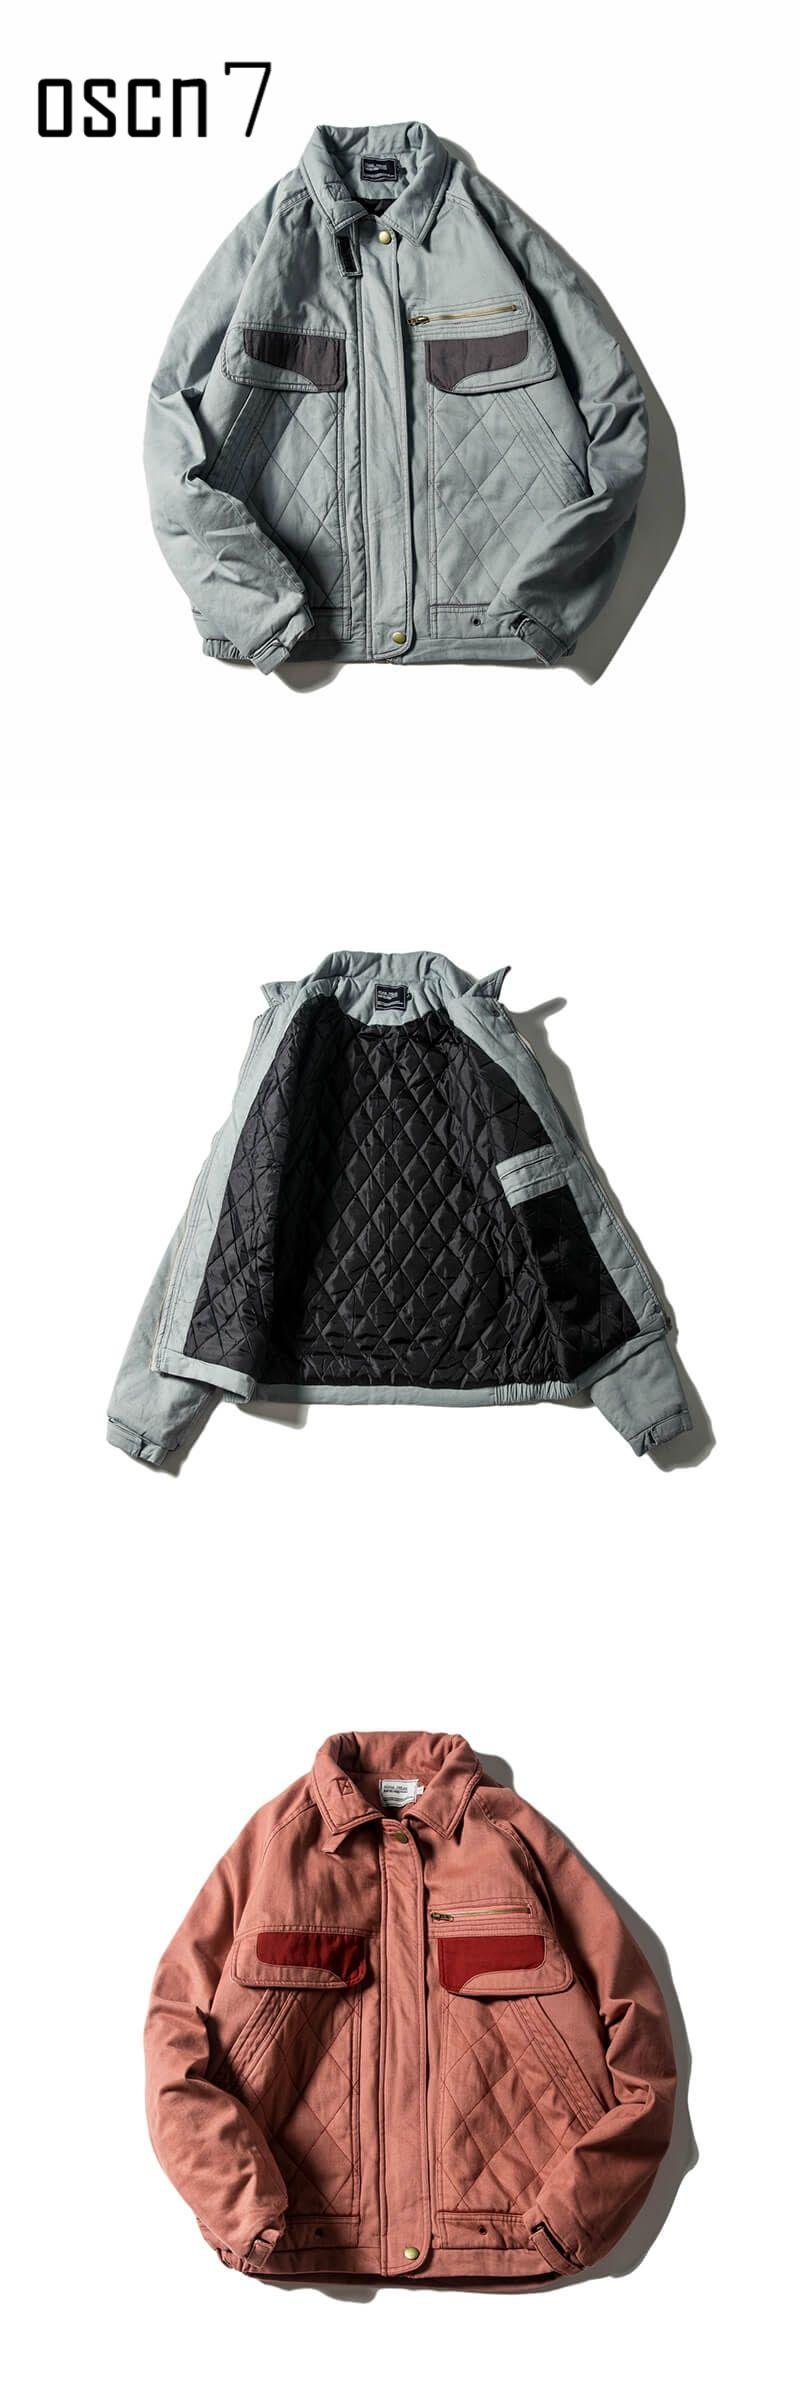 5a47e15be4f OSCN7 Winter Stretwear Oversize Bomber Jacket Parka Men 2017 New Casual  Fashion Thick Warm Wash Parka